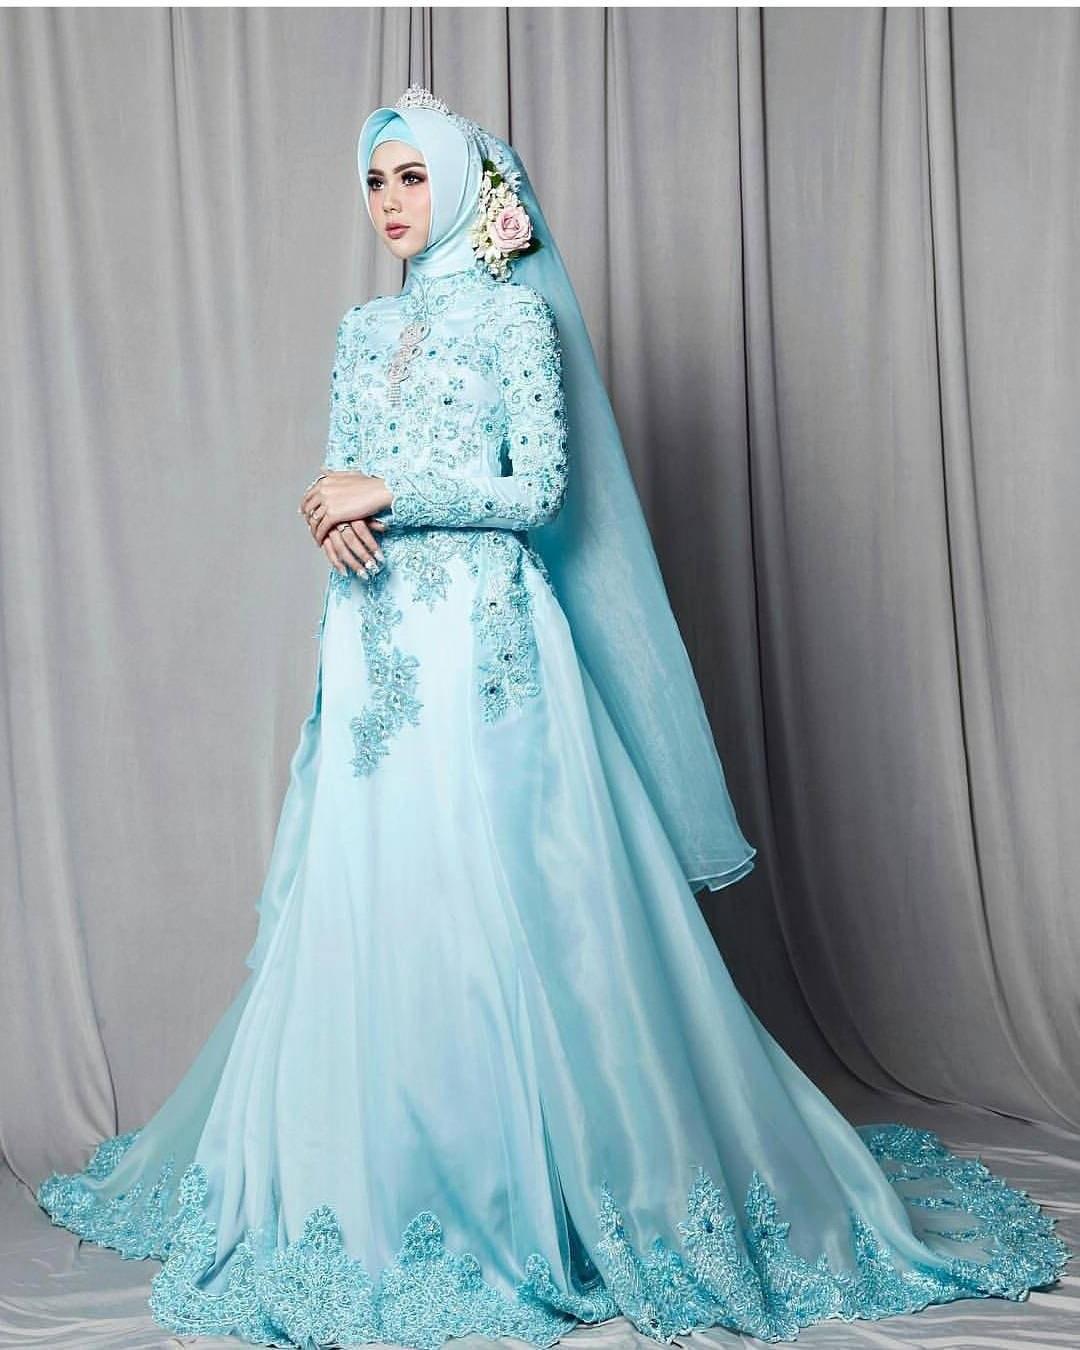 Bentuk Harga Gaun Pengantin Muslimah Syar'i Tldn 17 Model Baju Pengantin Muslim 2018 Desain Elegan Cantik